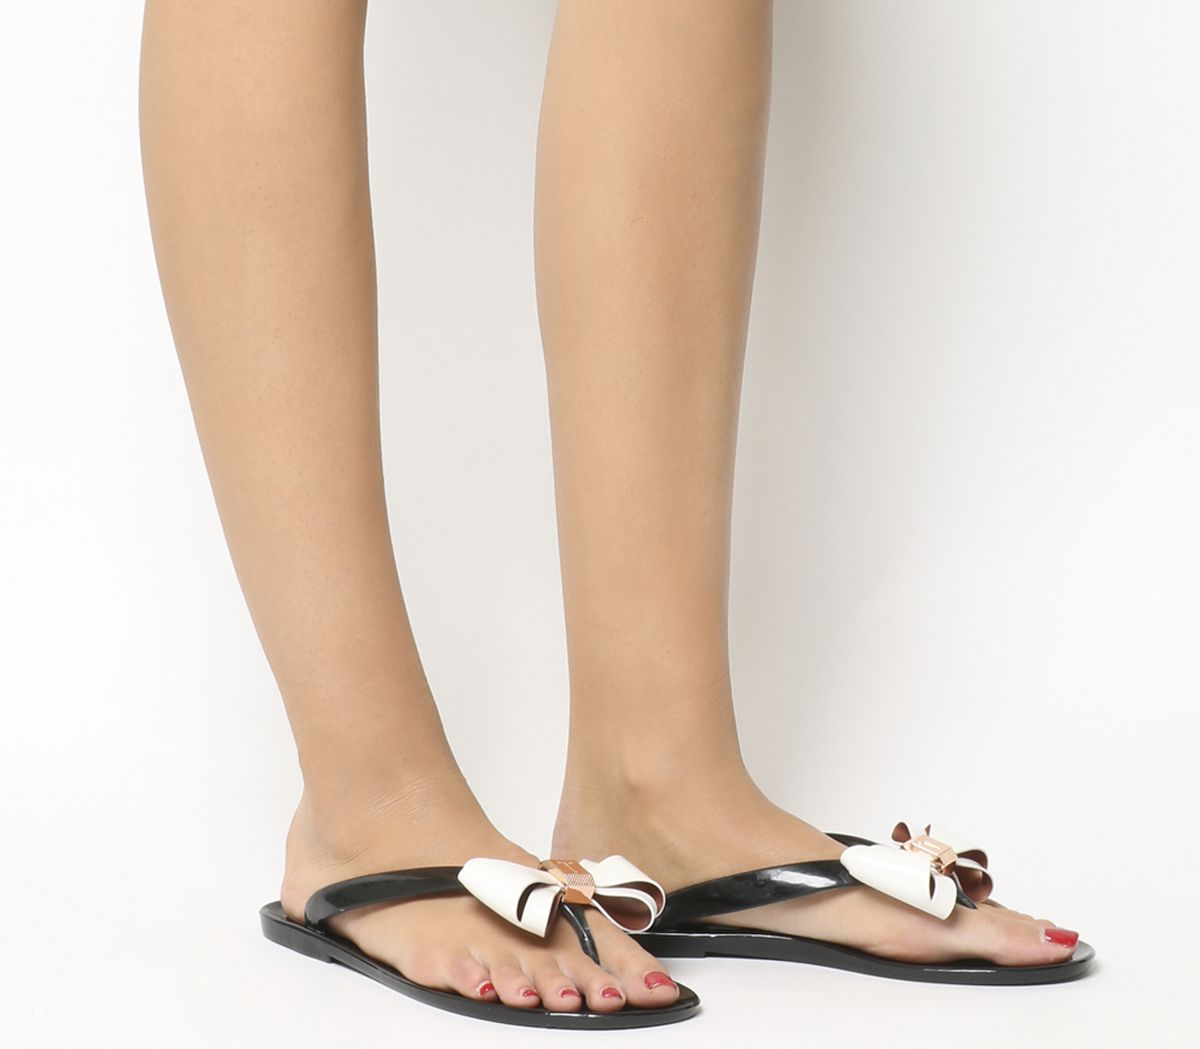 8a3899970 Ted Baker Rafeek Flip Flop Black Cream - Sandals